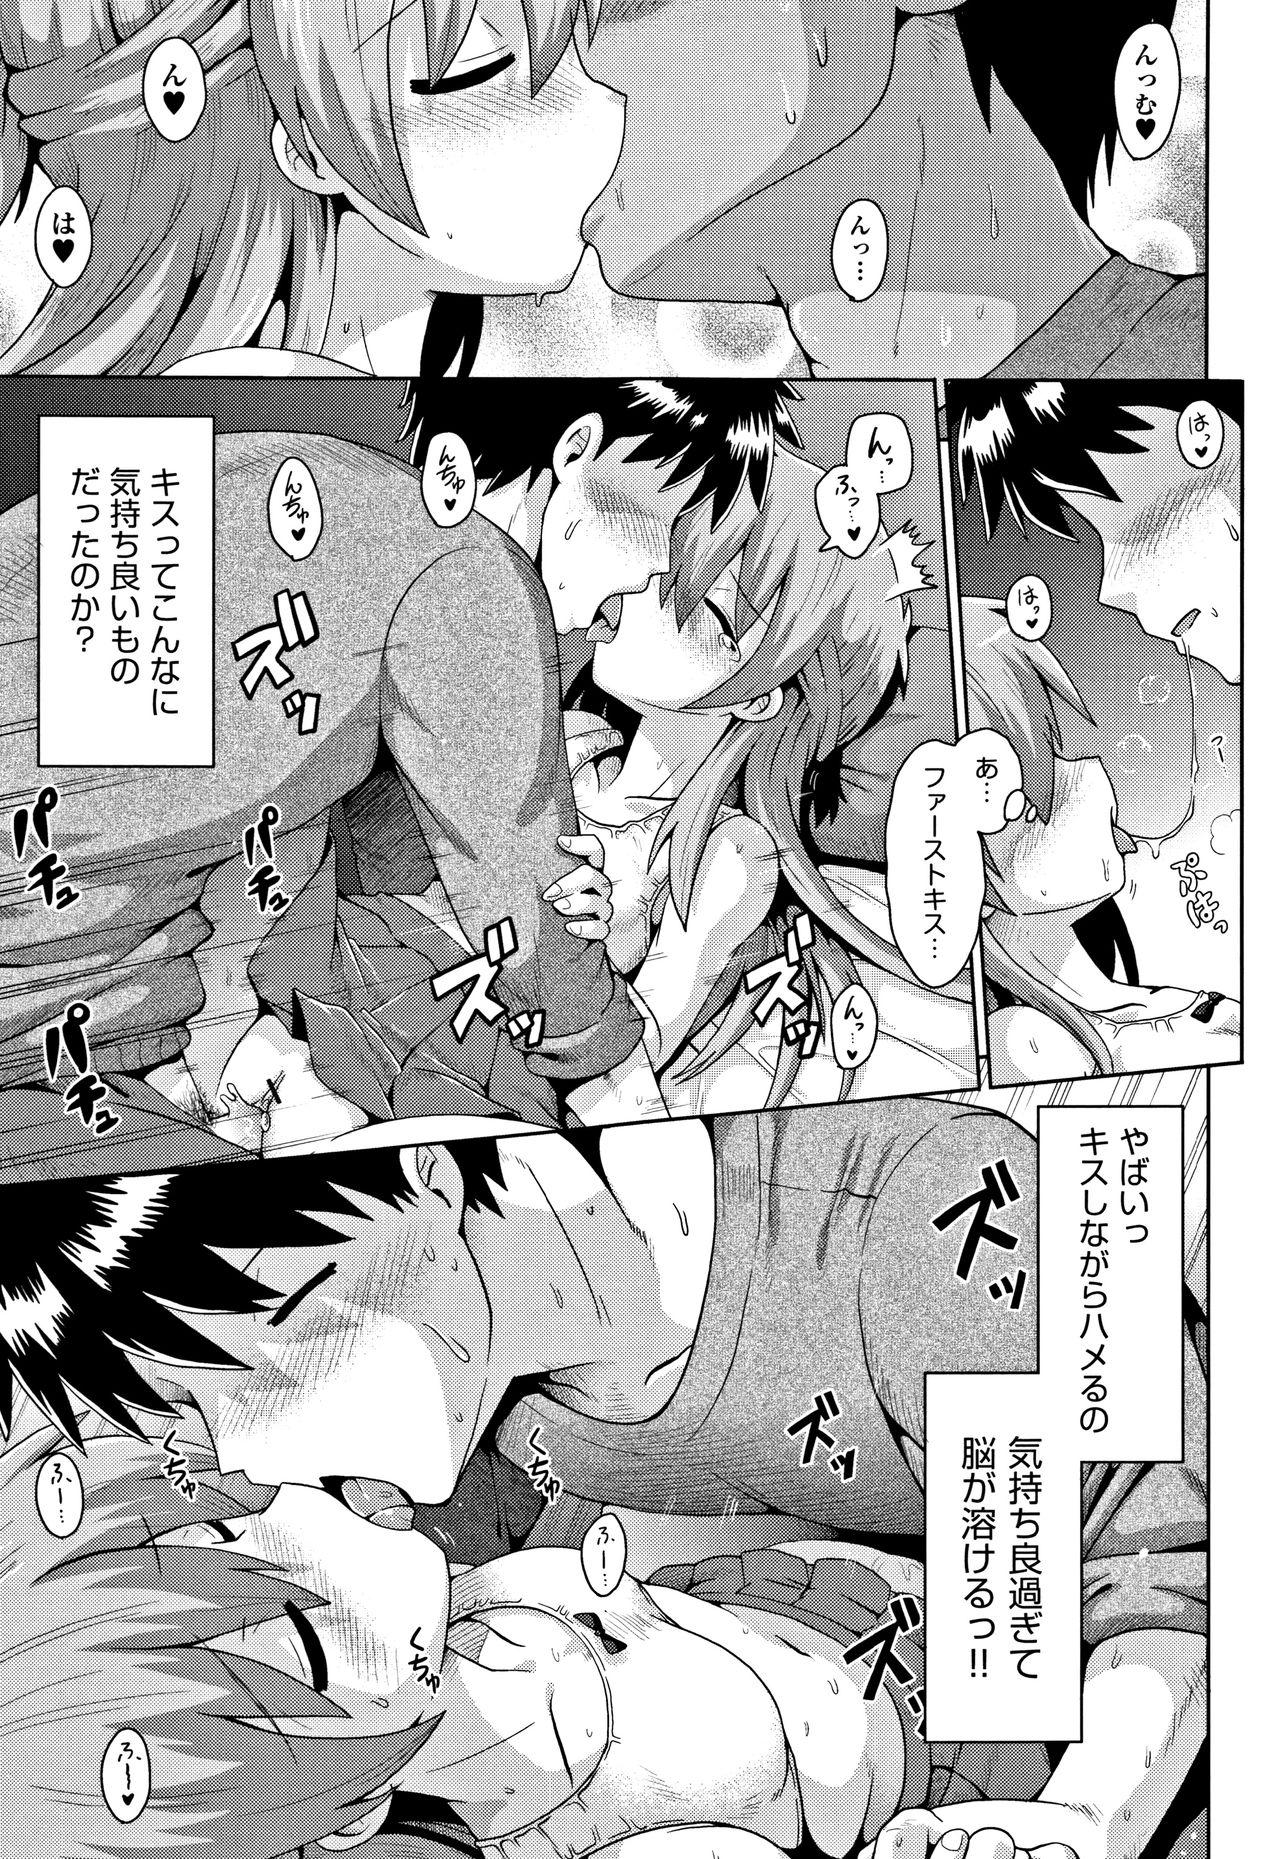 Kokugo Sansuu Rika Sex 69